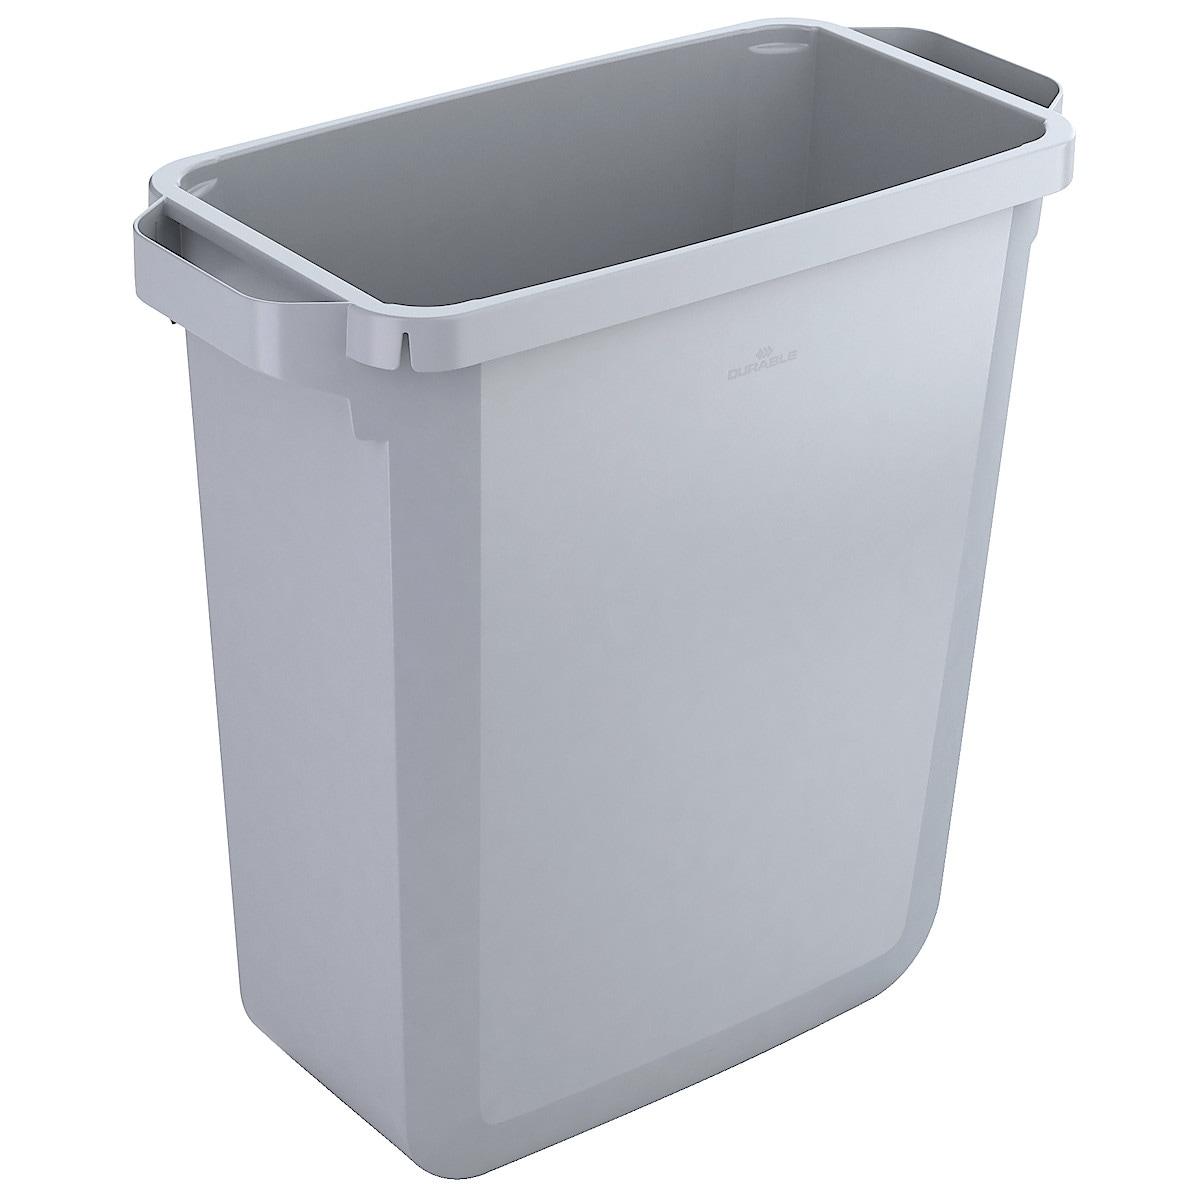 Soptunna Durabin 60 l grå